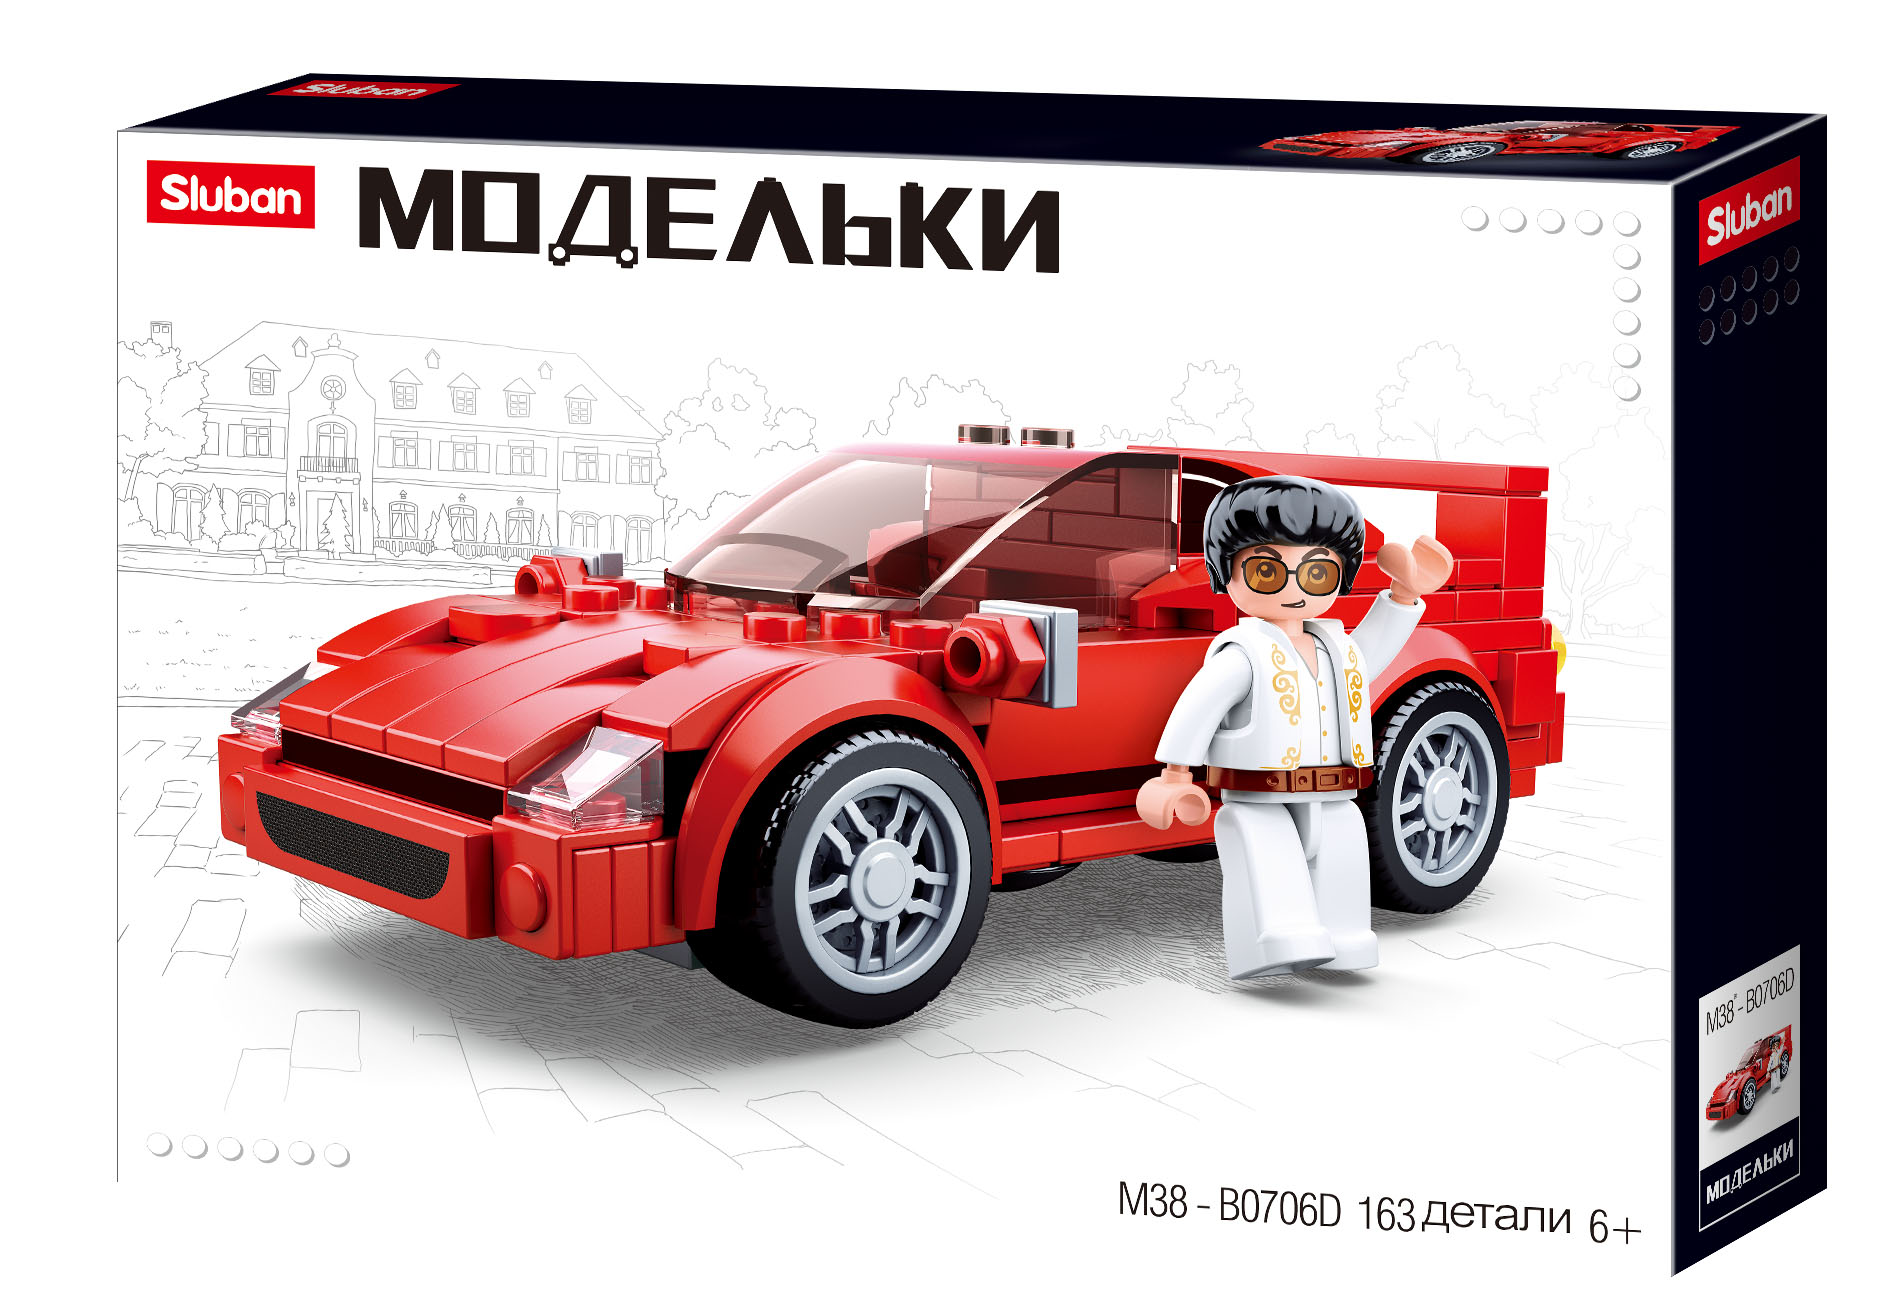 Конструктор Sluban Модельки, 163 детали